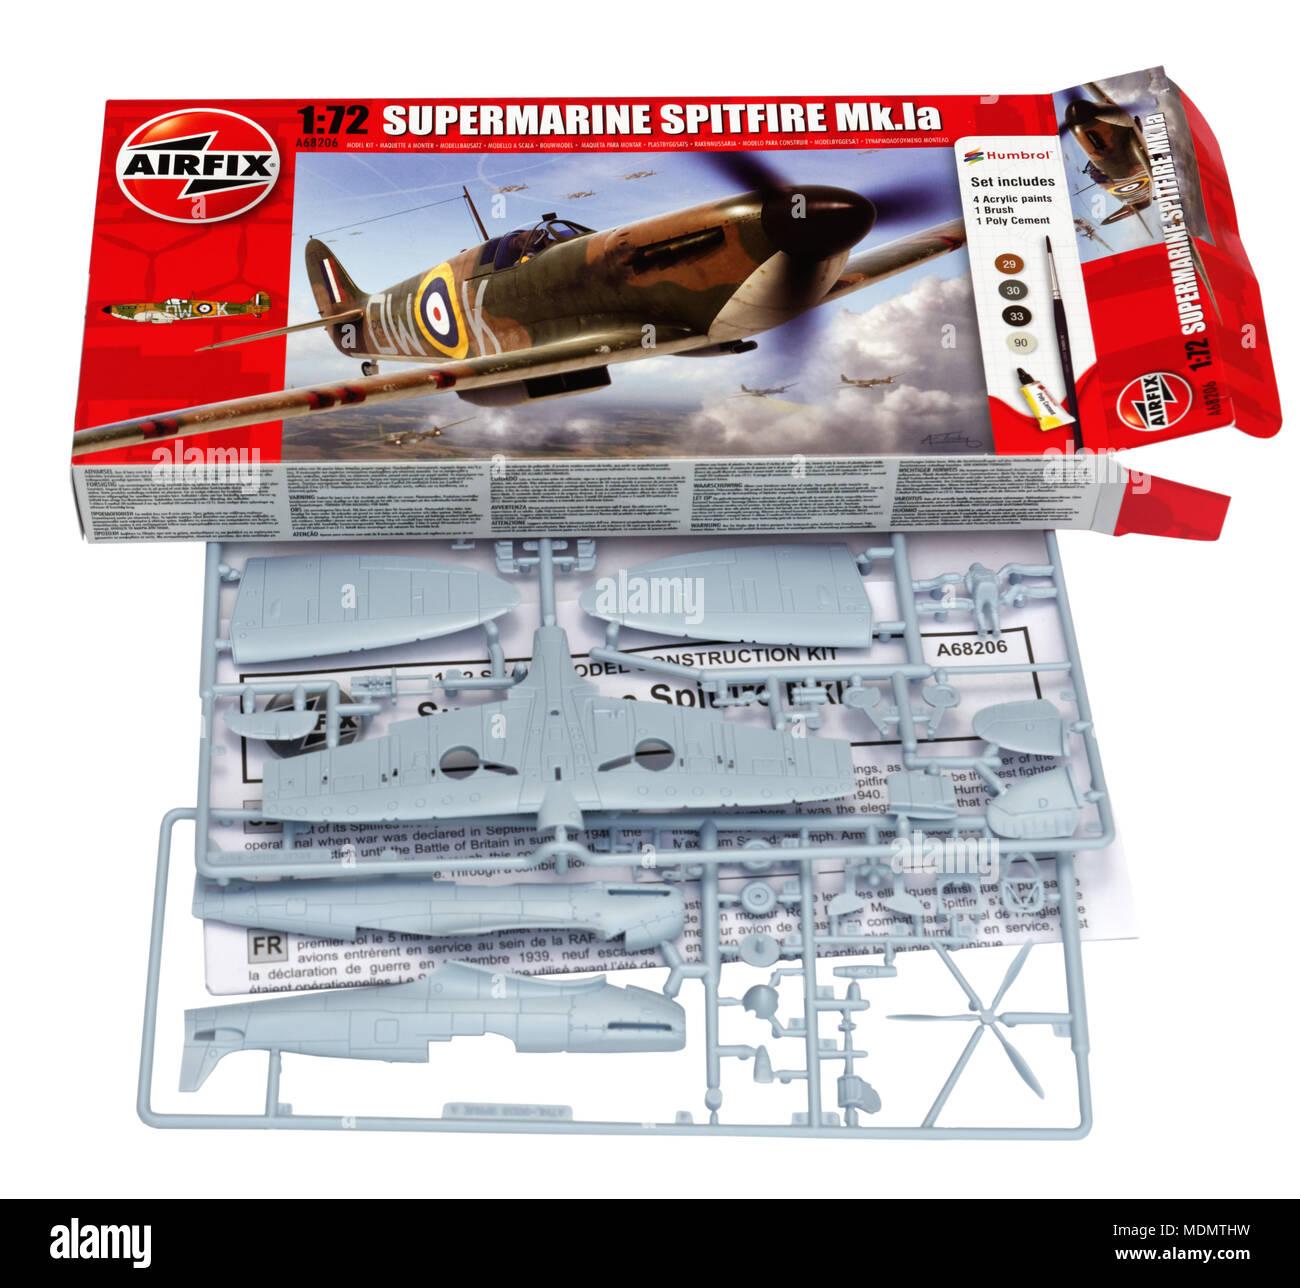 Model Aeroplane Kit Stock Photos & Model Aeroplane Kit Stock